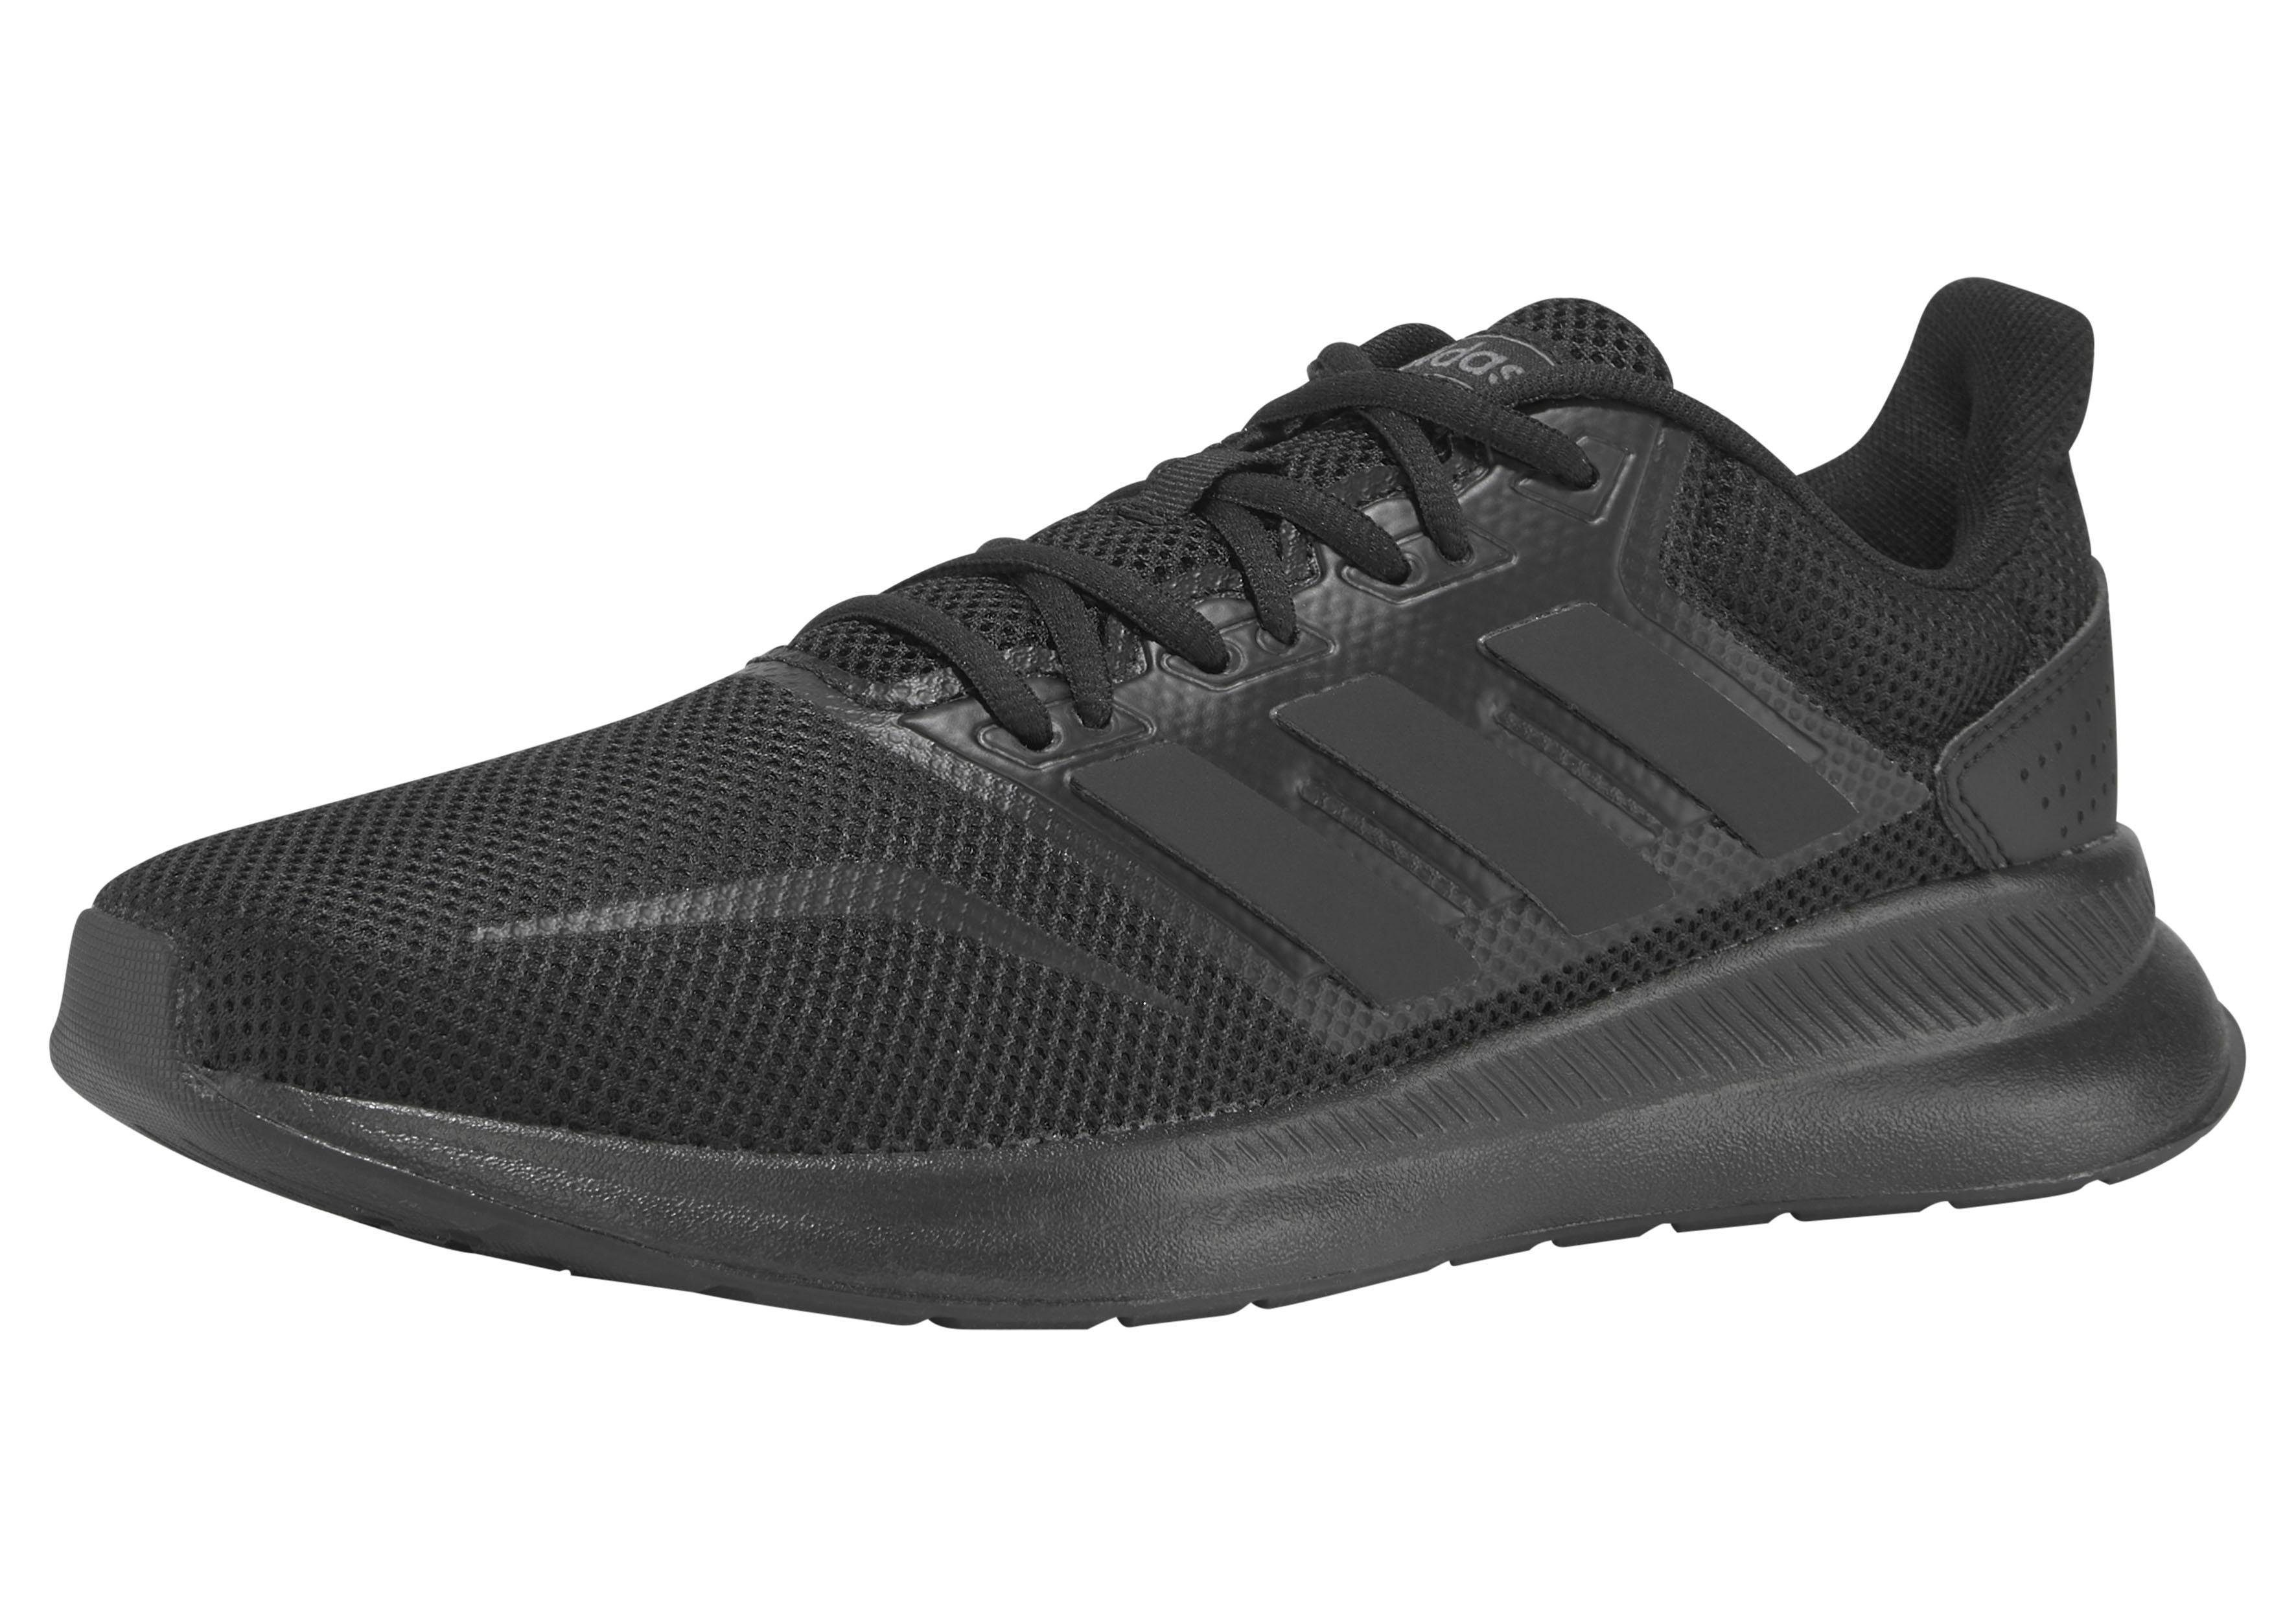 adidas »RUN FALCON« Laufschuh online kaufen | OTTO